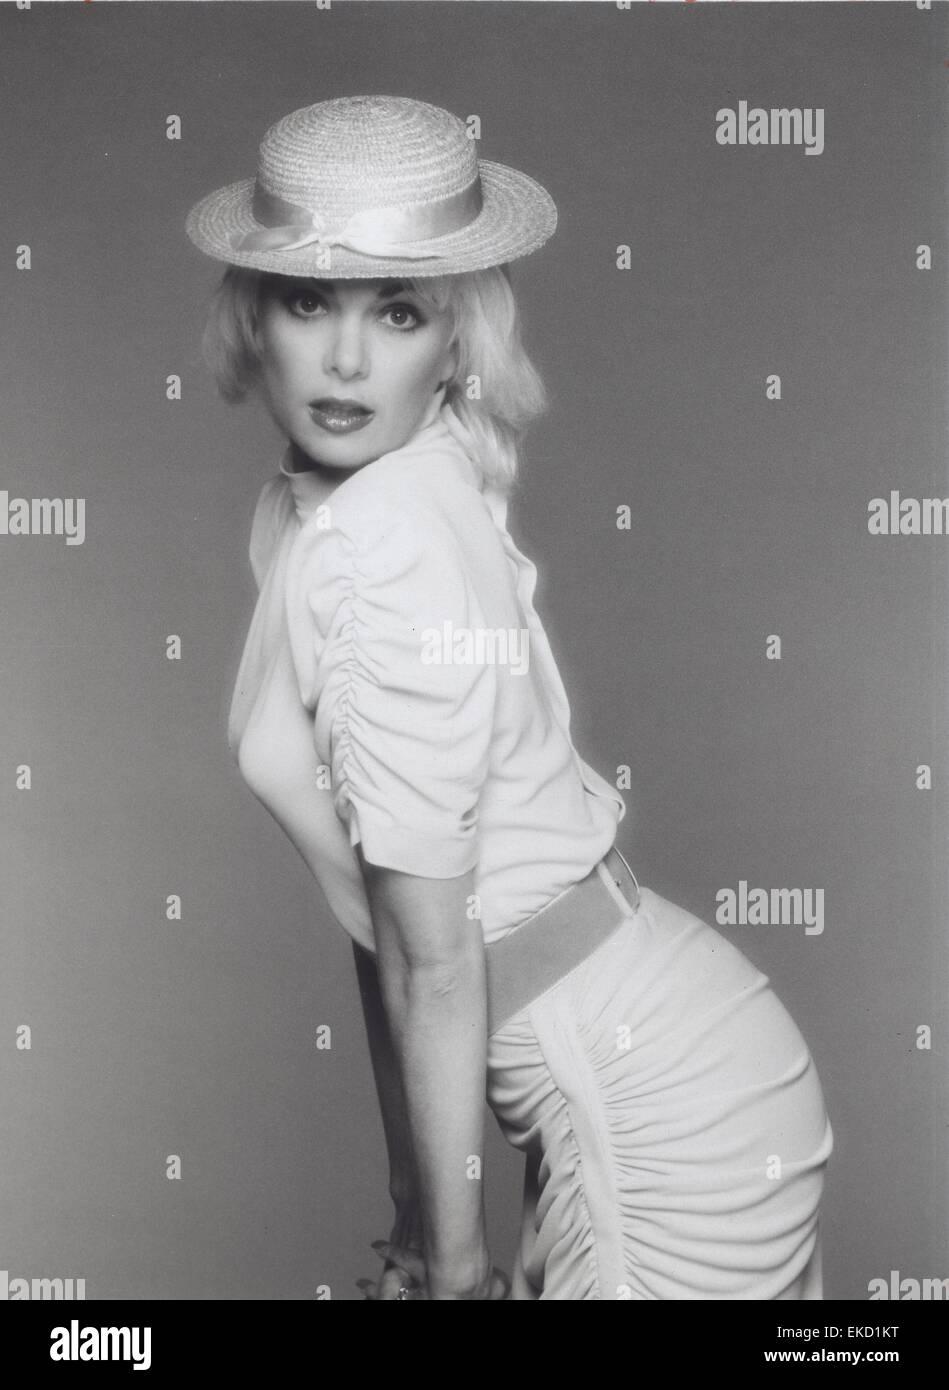 Ann Jillian nude (51 foto and video), Tits, Paparazzi, Boobs, cleavage 2006